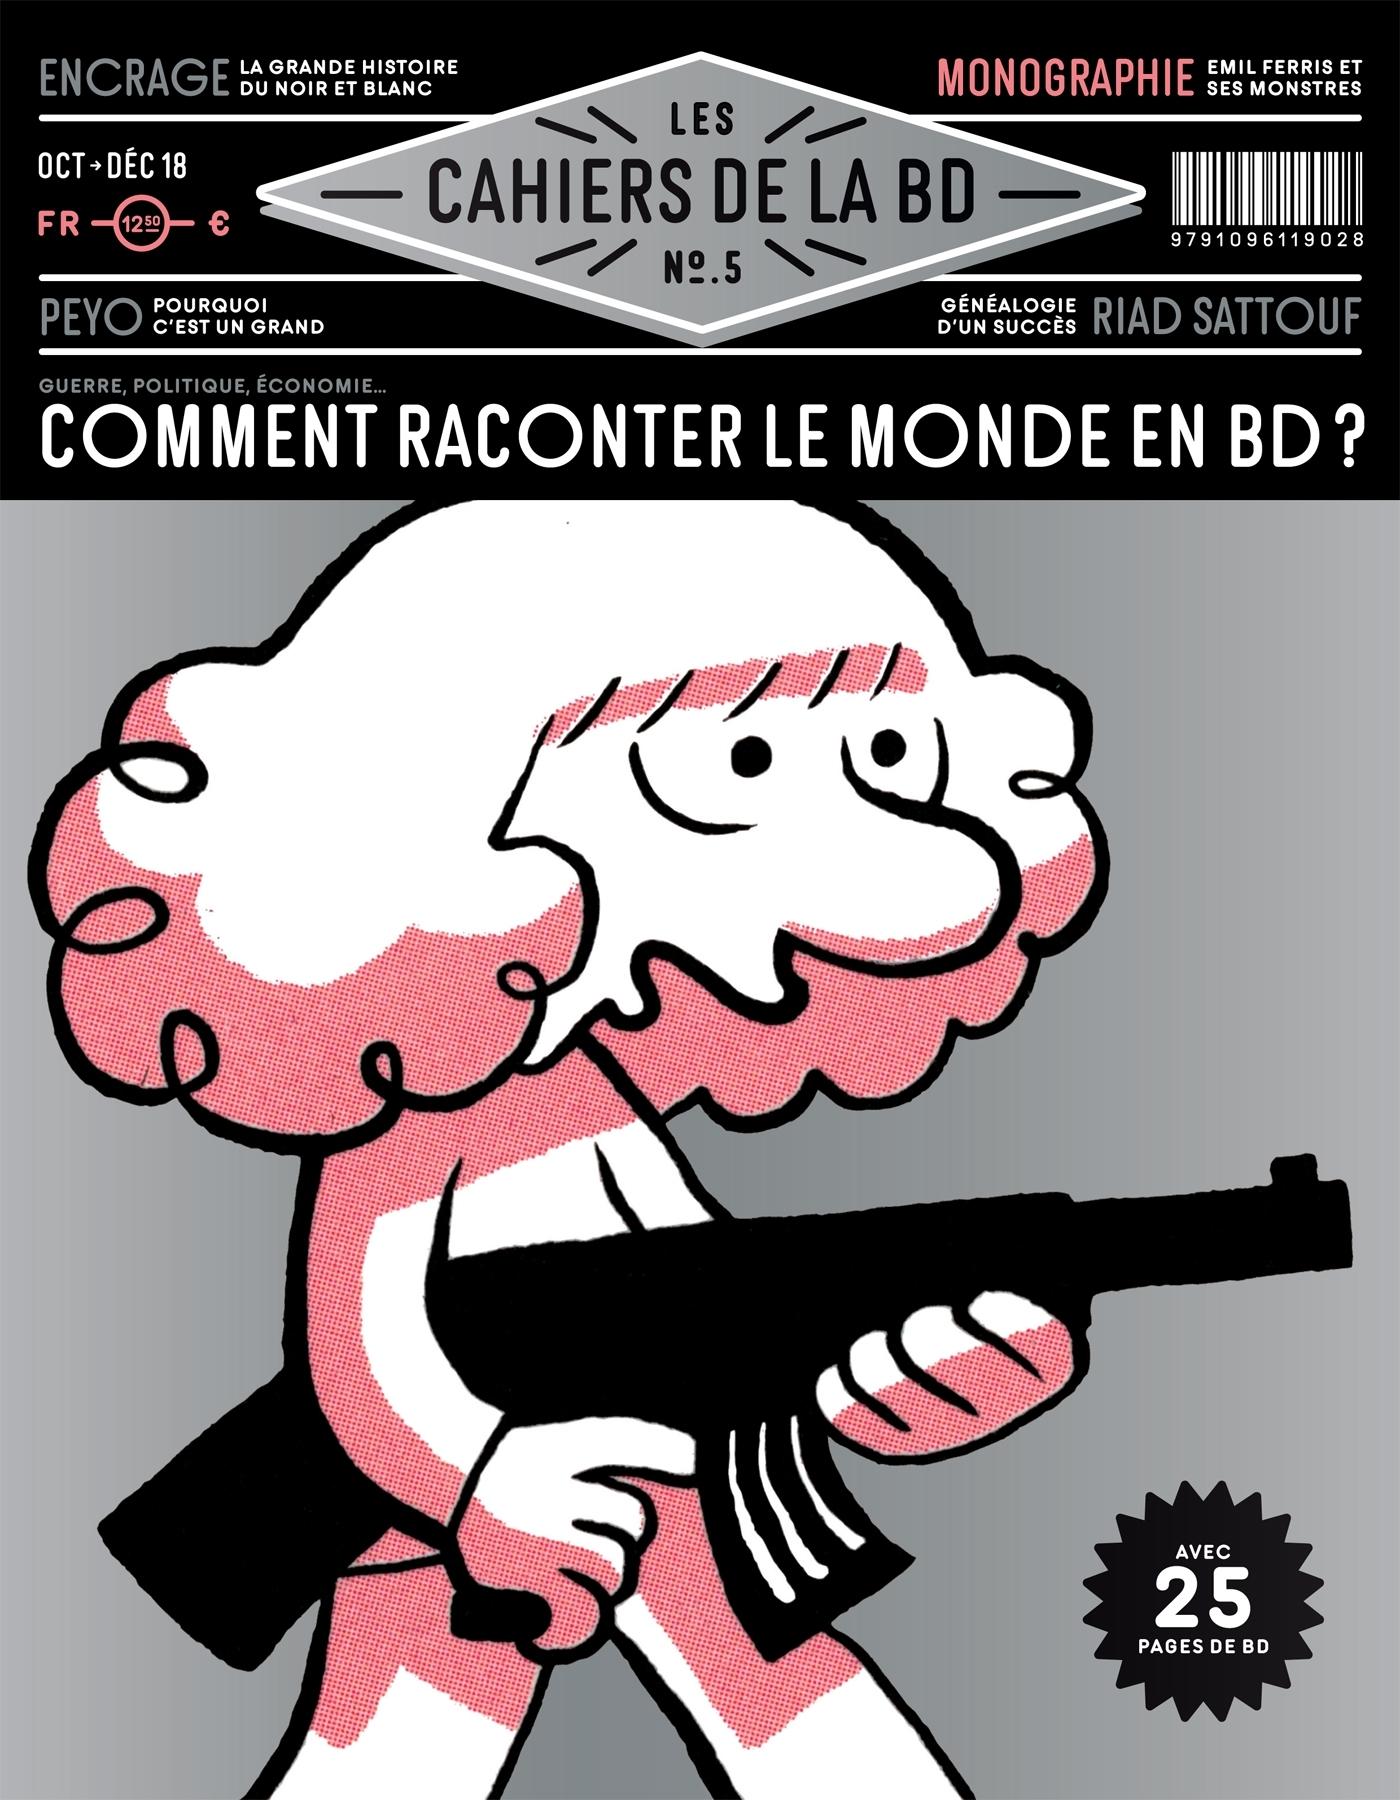 LES CAHIERS DE LA BD - T05 - LES CAHIERS DE LA BD N 5